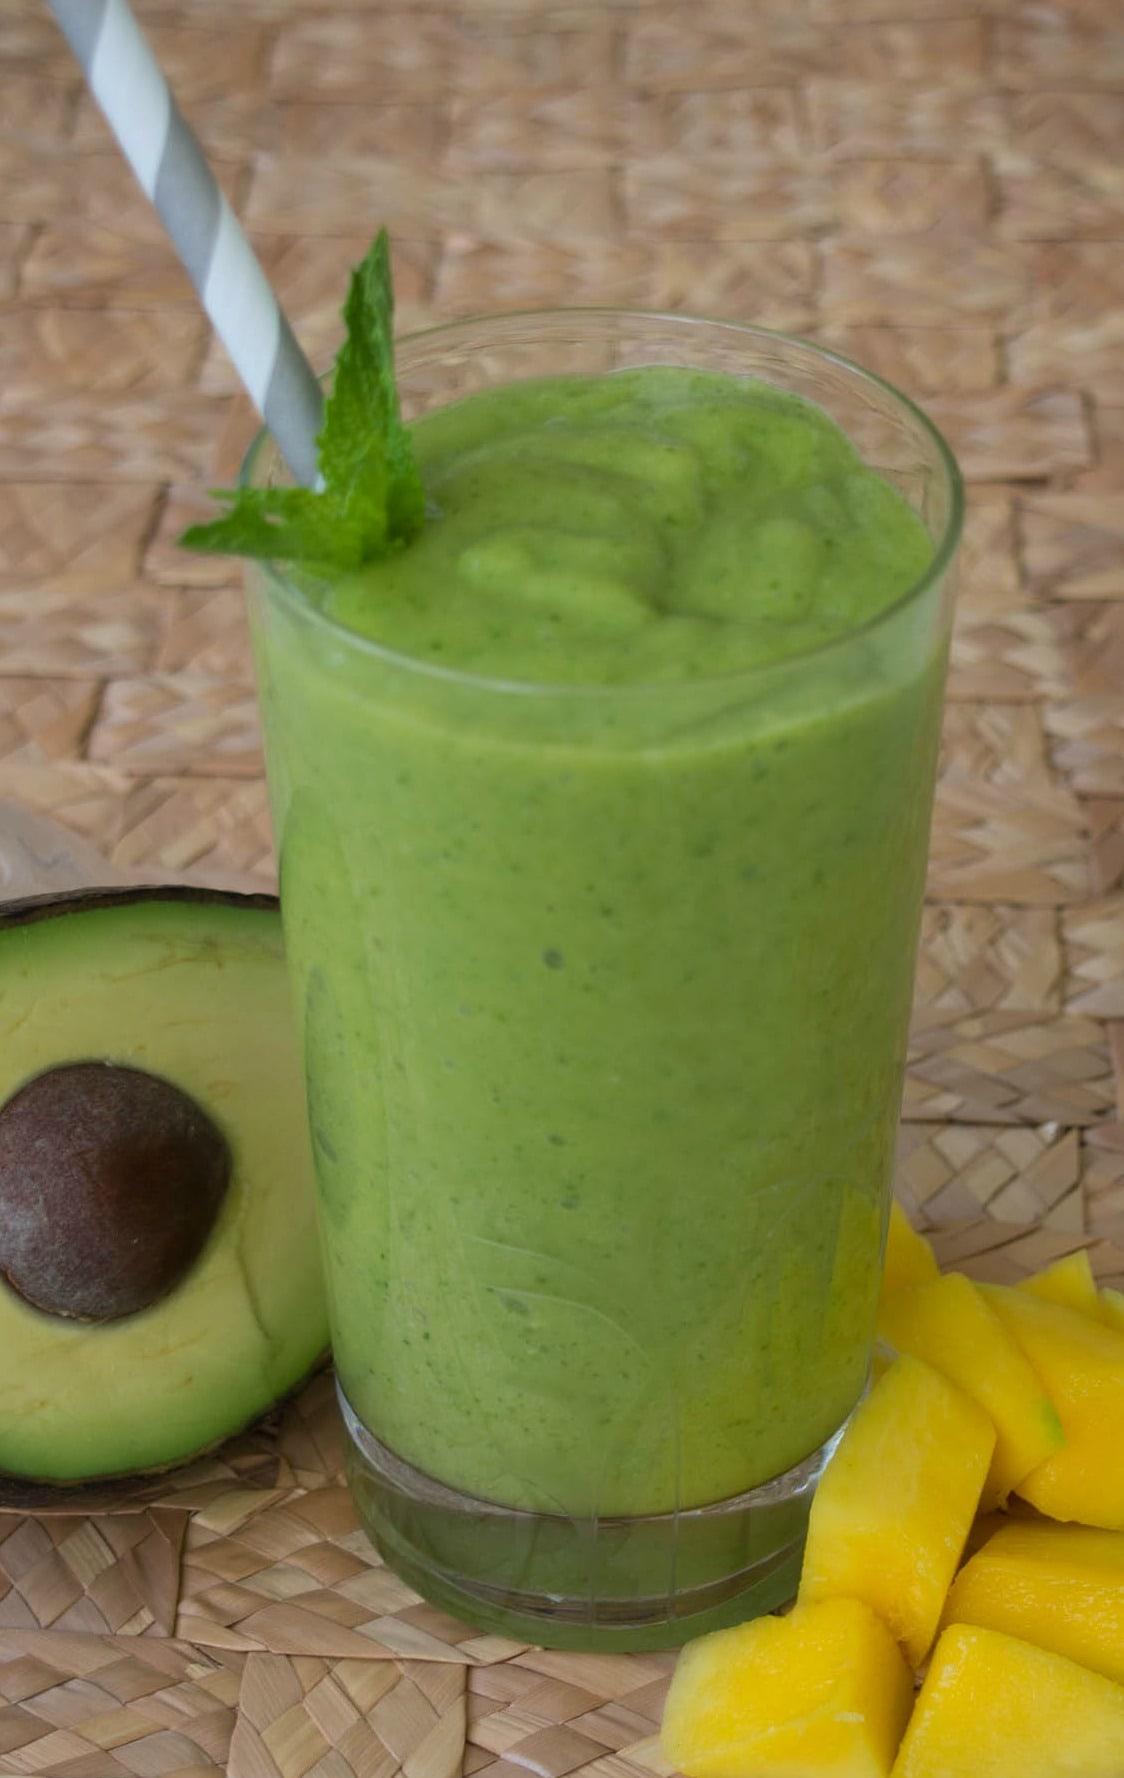 Mango Avocado Smoothie   Dairy Free Smoothie   Easy 5 Ingredient Smoothie   Green Smoothie   Healthy Snack   Green Food   St. Patrick's Day Treat